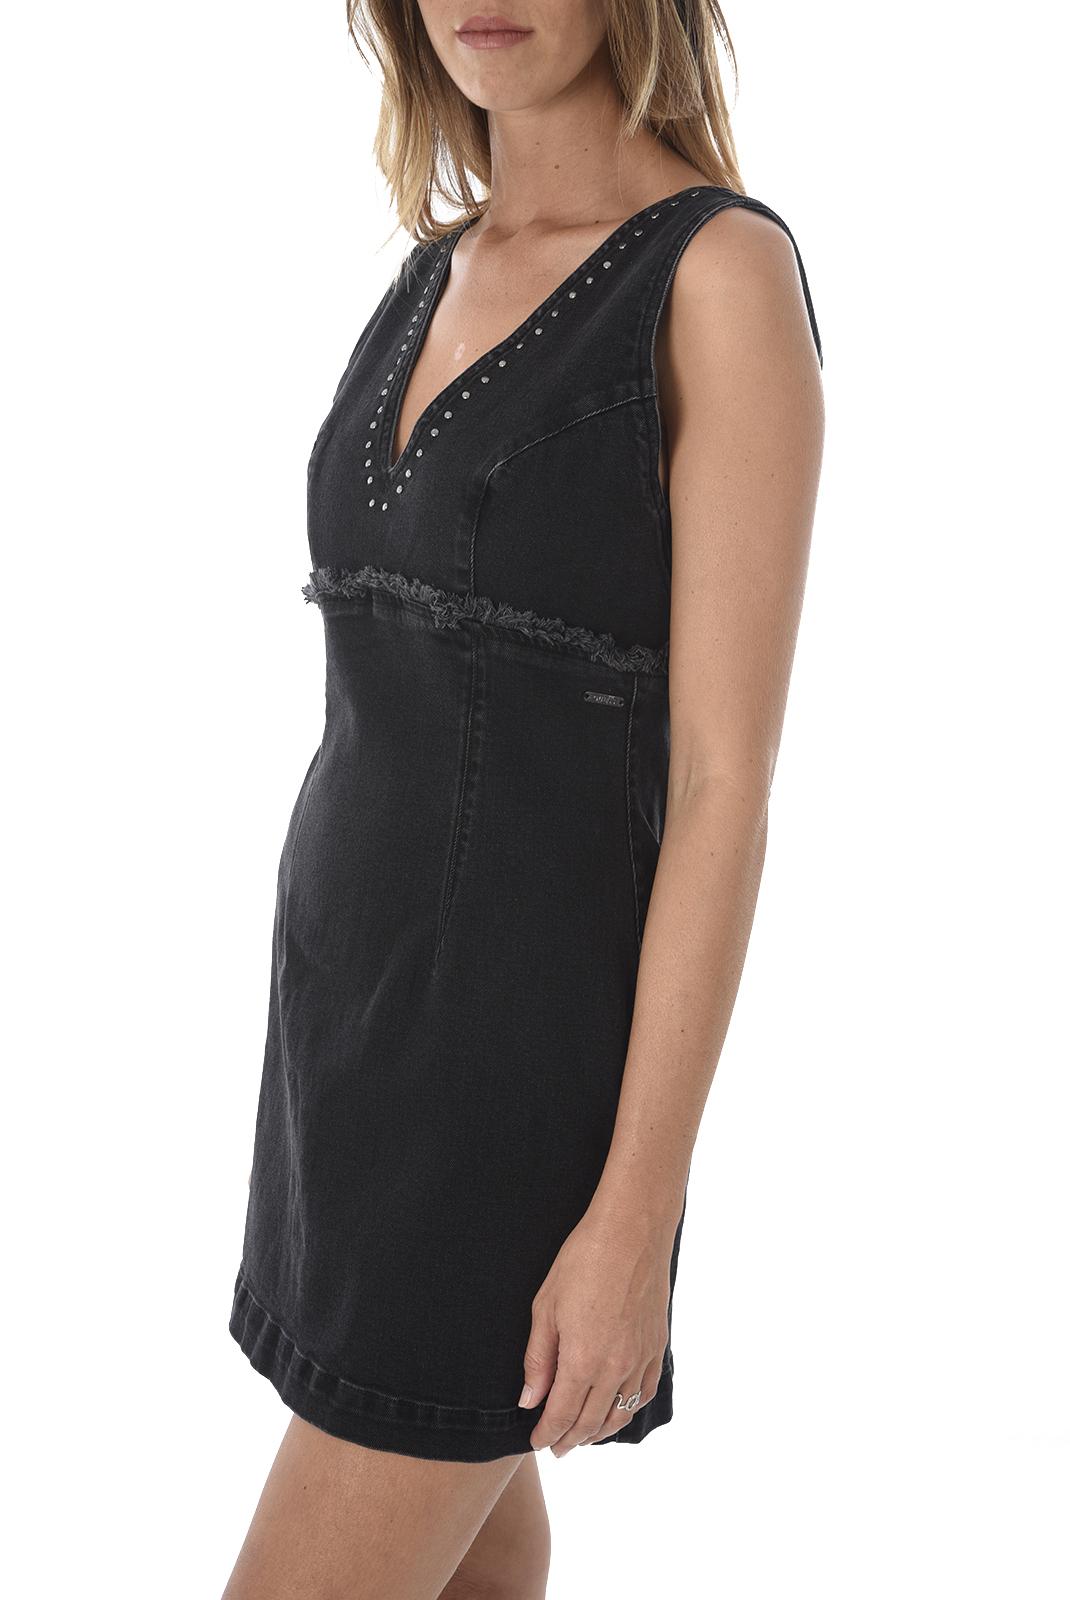 FEMME  Guess jeans W82K04 D32R0 GLAM BLACK